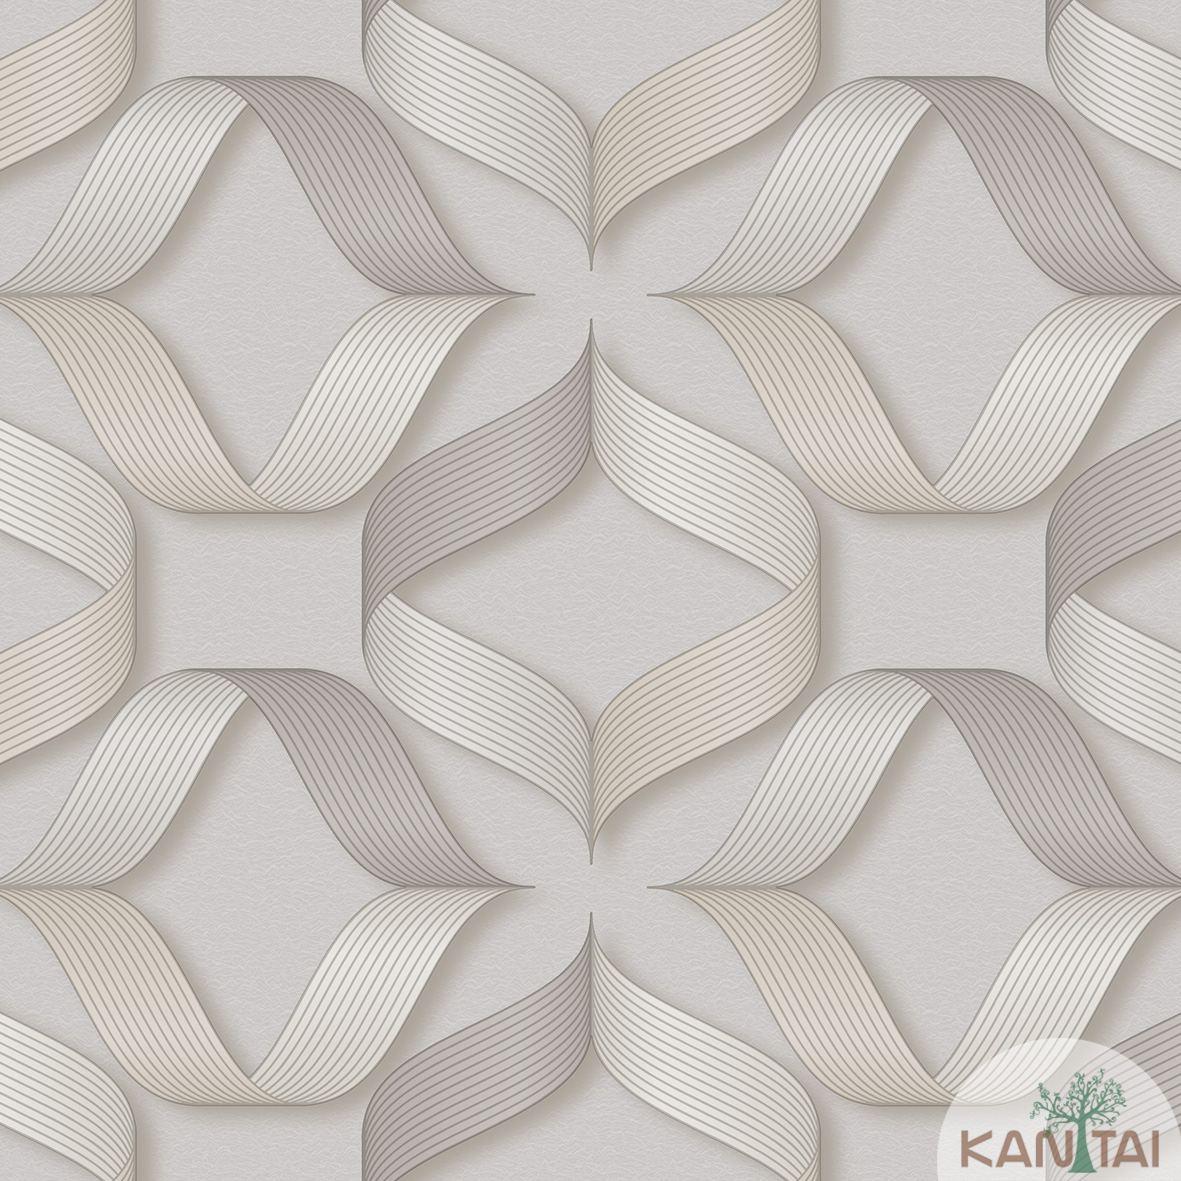 Papel de Parede   Kan Tai  Vinilico Coleção Neonature III 3D Geométrico Formas Cinza, Marrom Claro